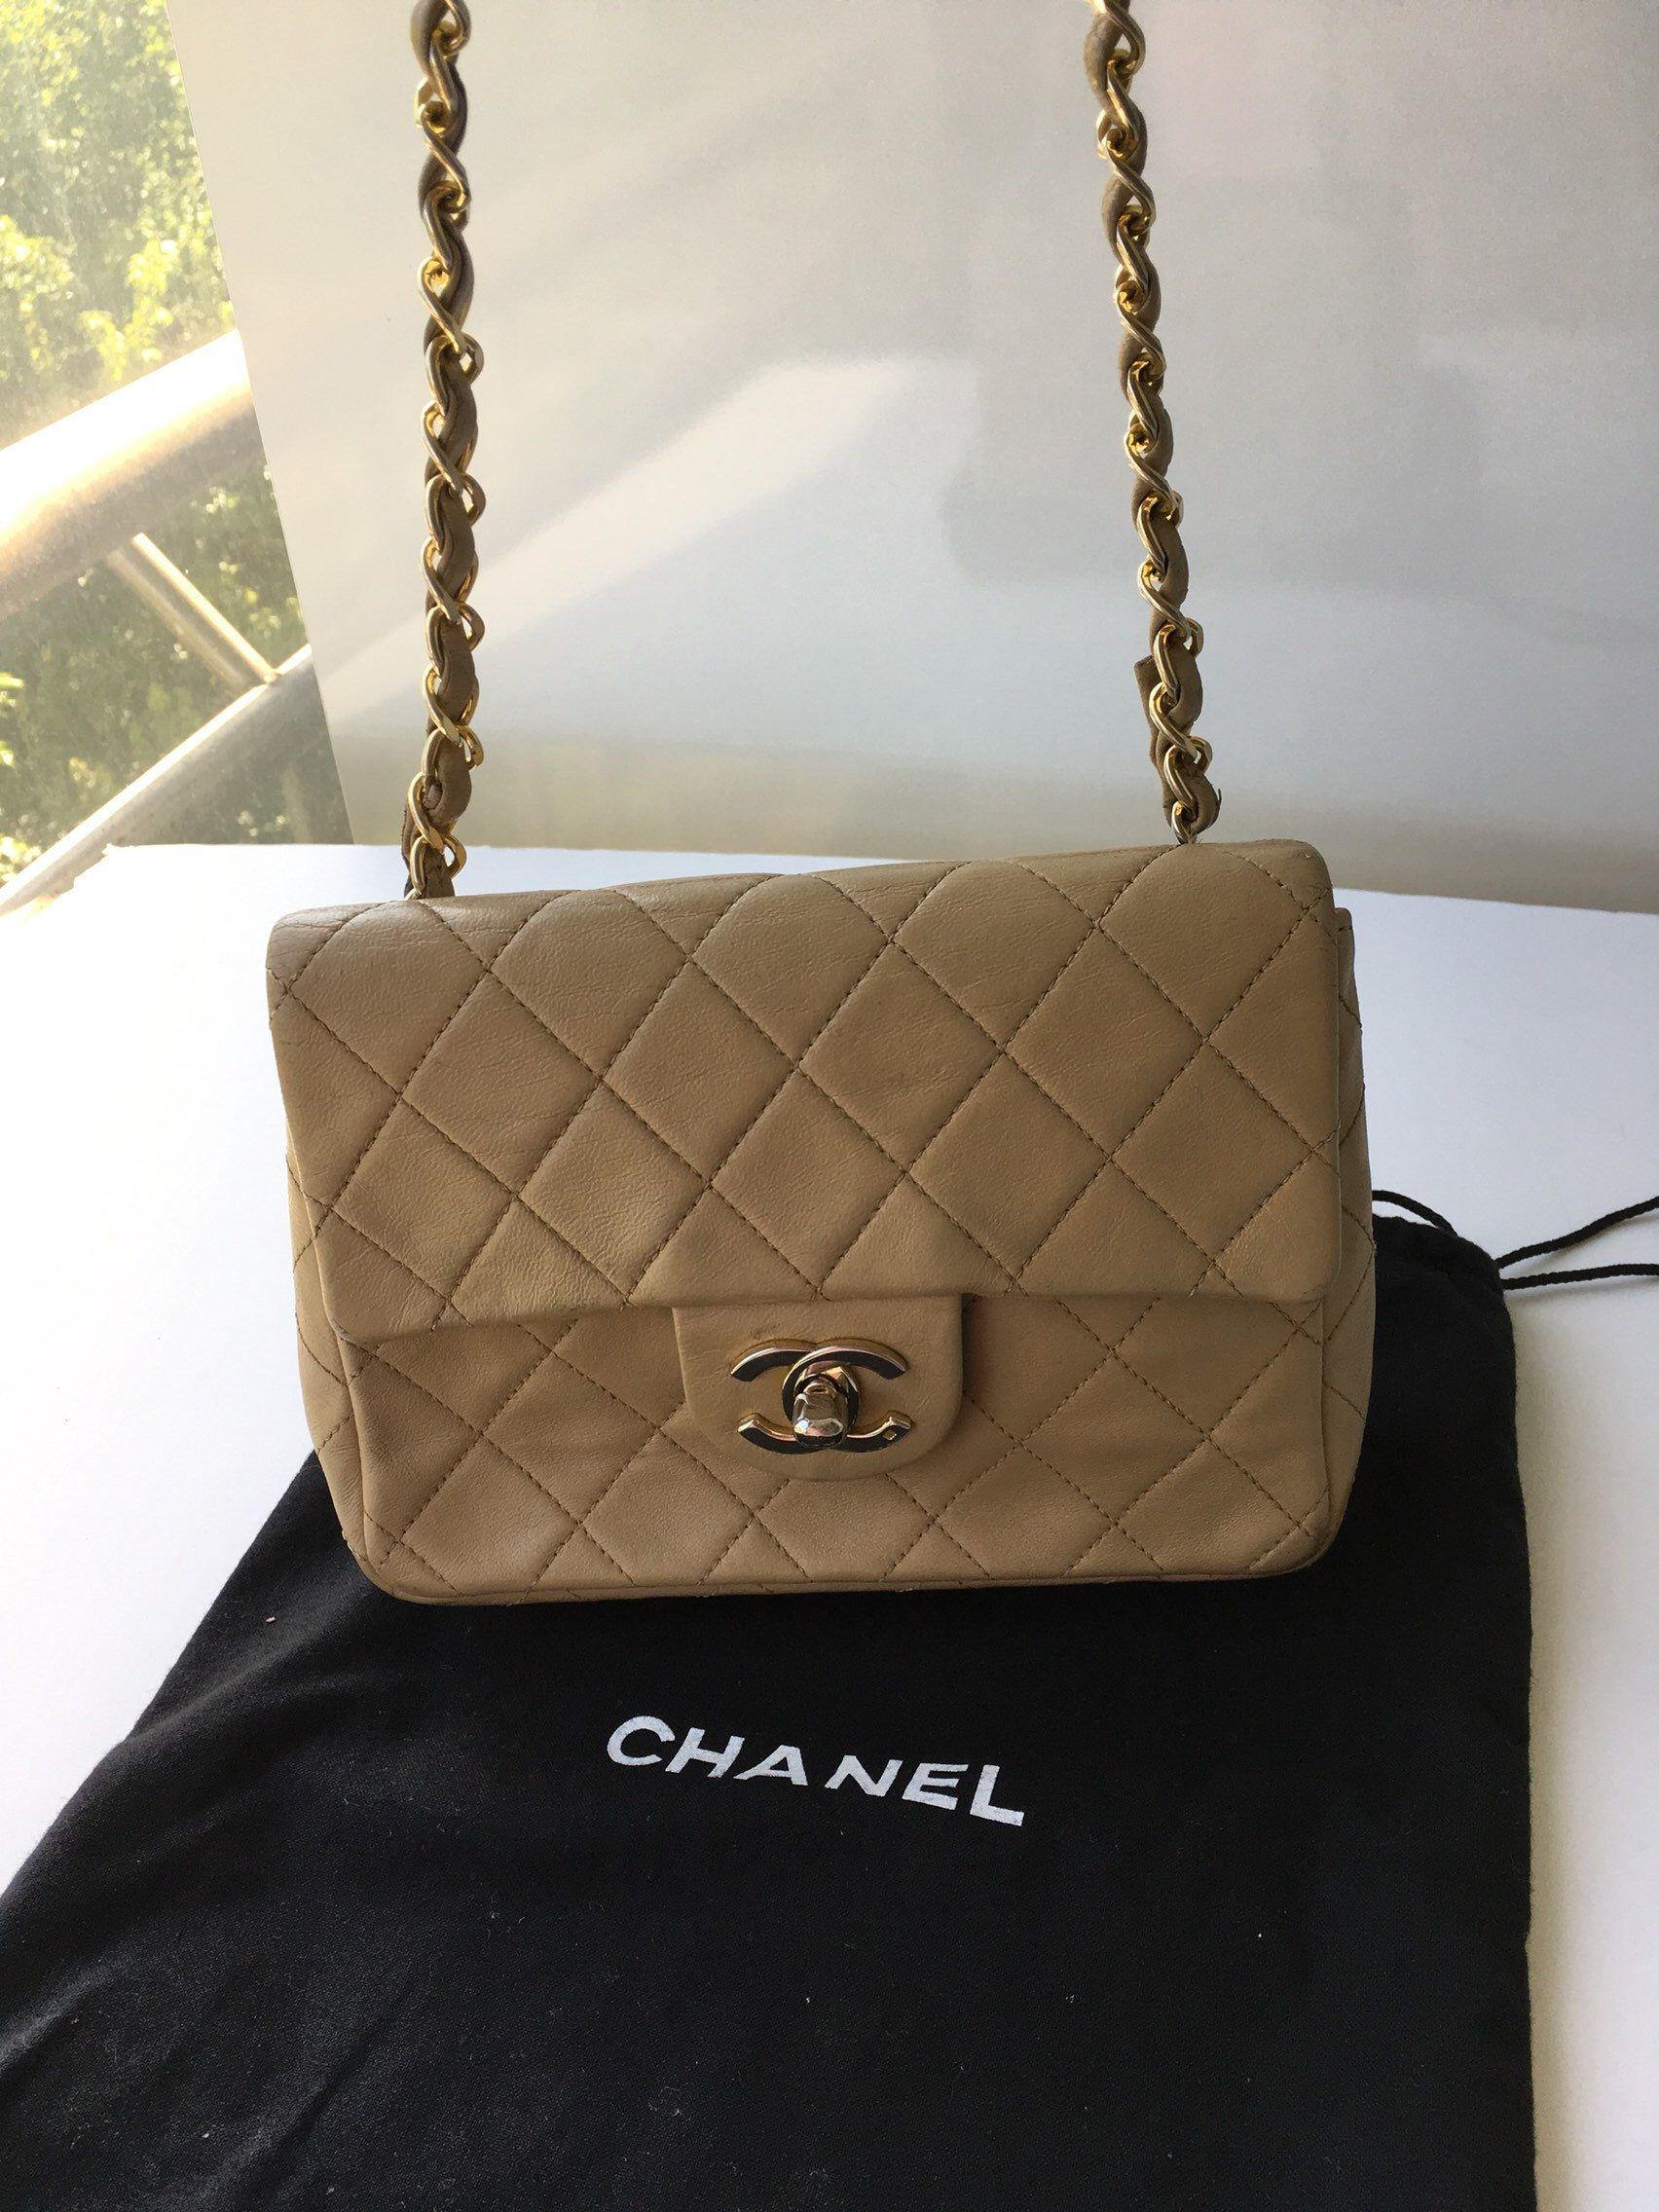 b5acbf00c53779 Chanel Vintage Authentic Beige Lambskin Quilted Mini Square Classic Flap  Bag Mini Matelasse Beige Chain Shoulder Bag Flap Crossbody #chanel90sbag ...